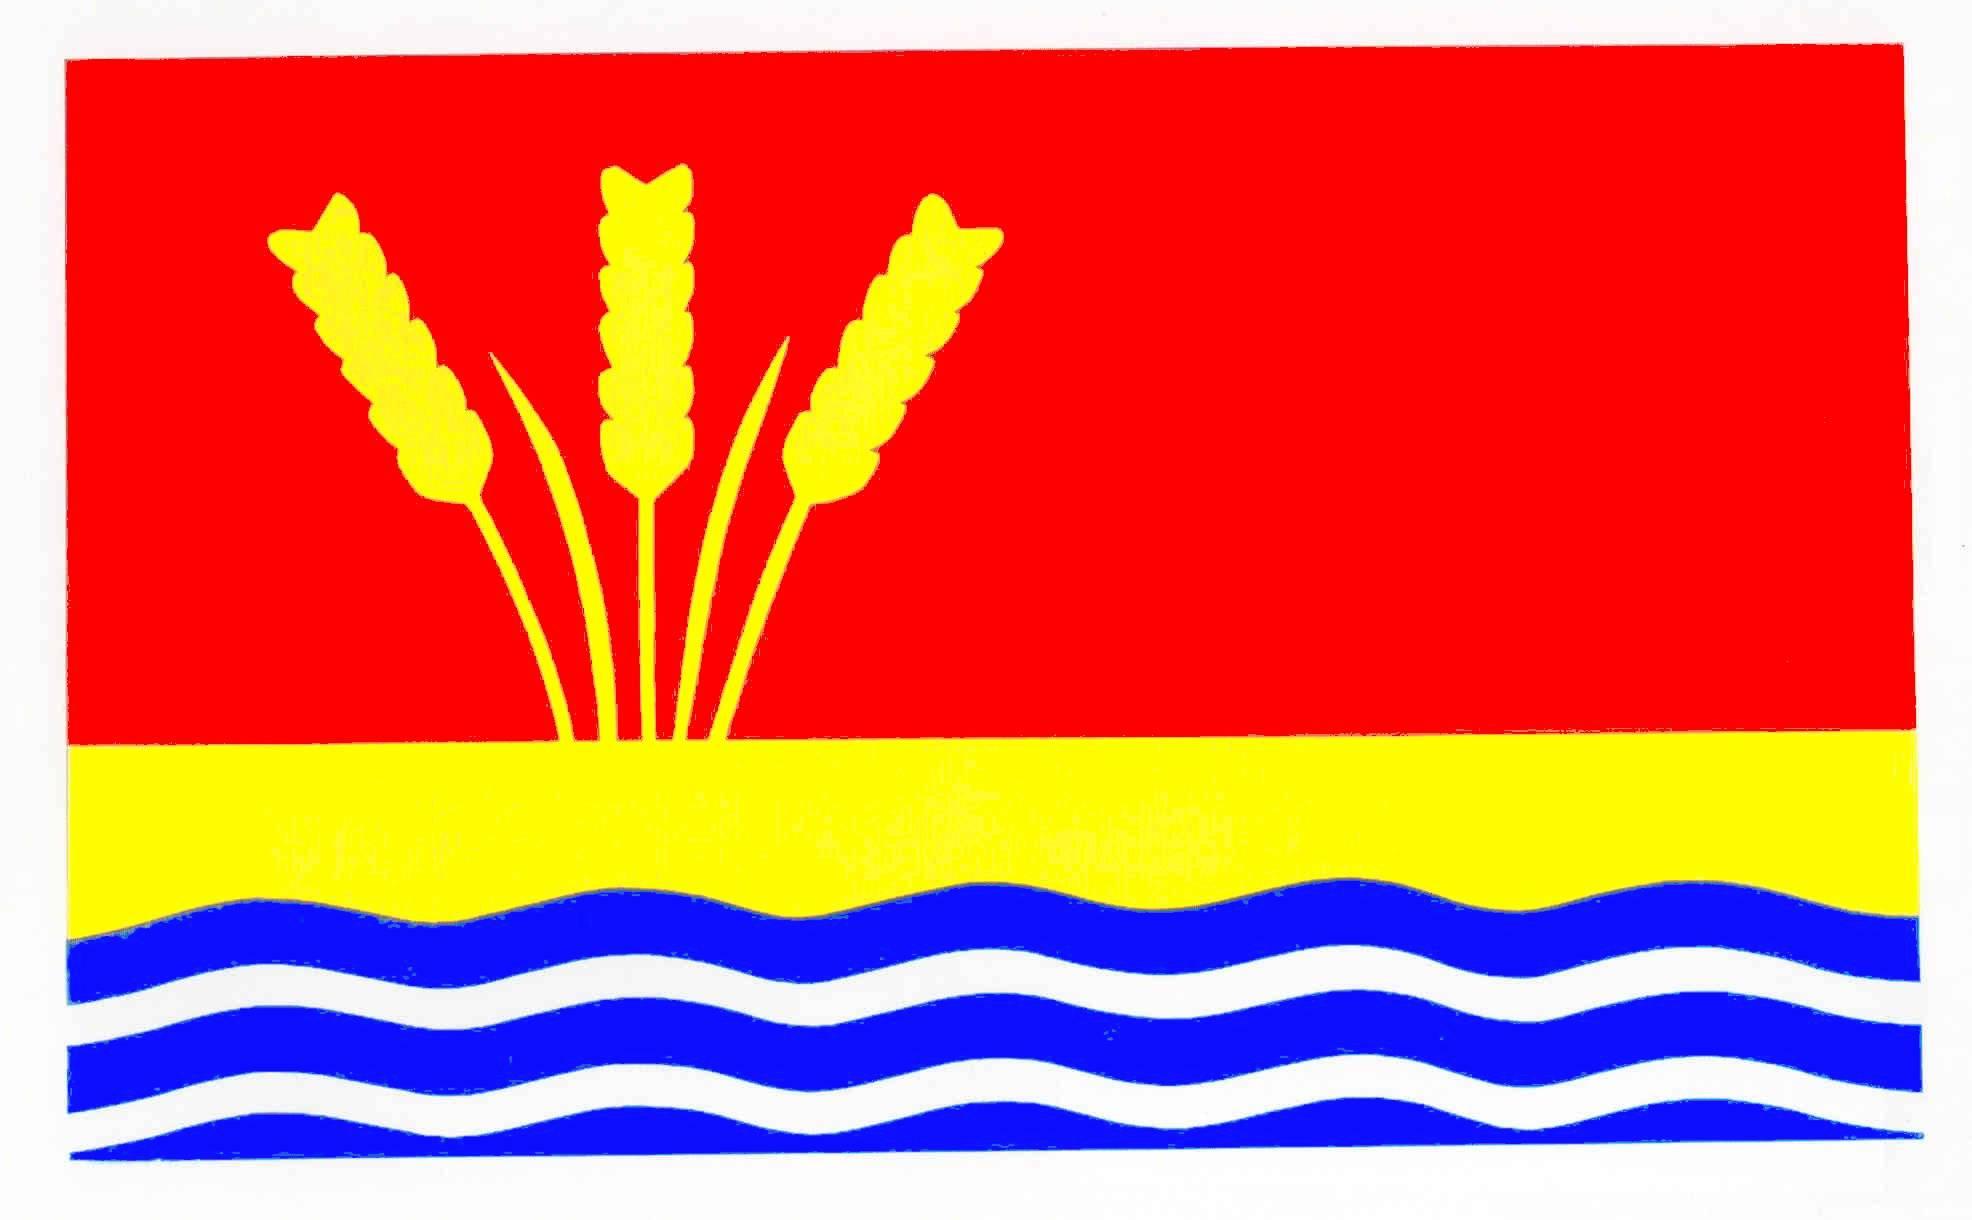 Flagge GemeindeBosbüll, Kreis Nordfriesland